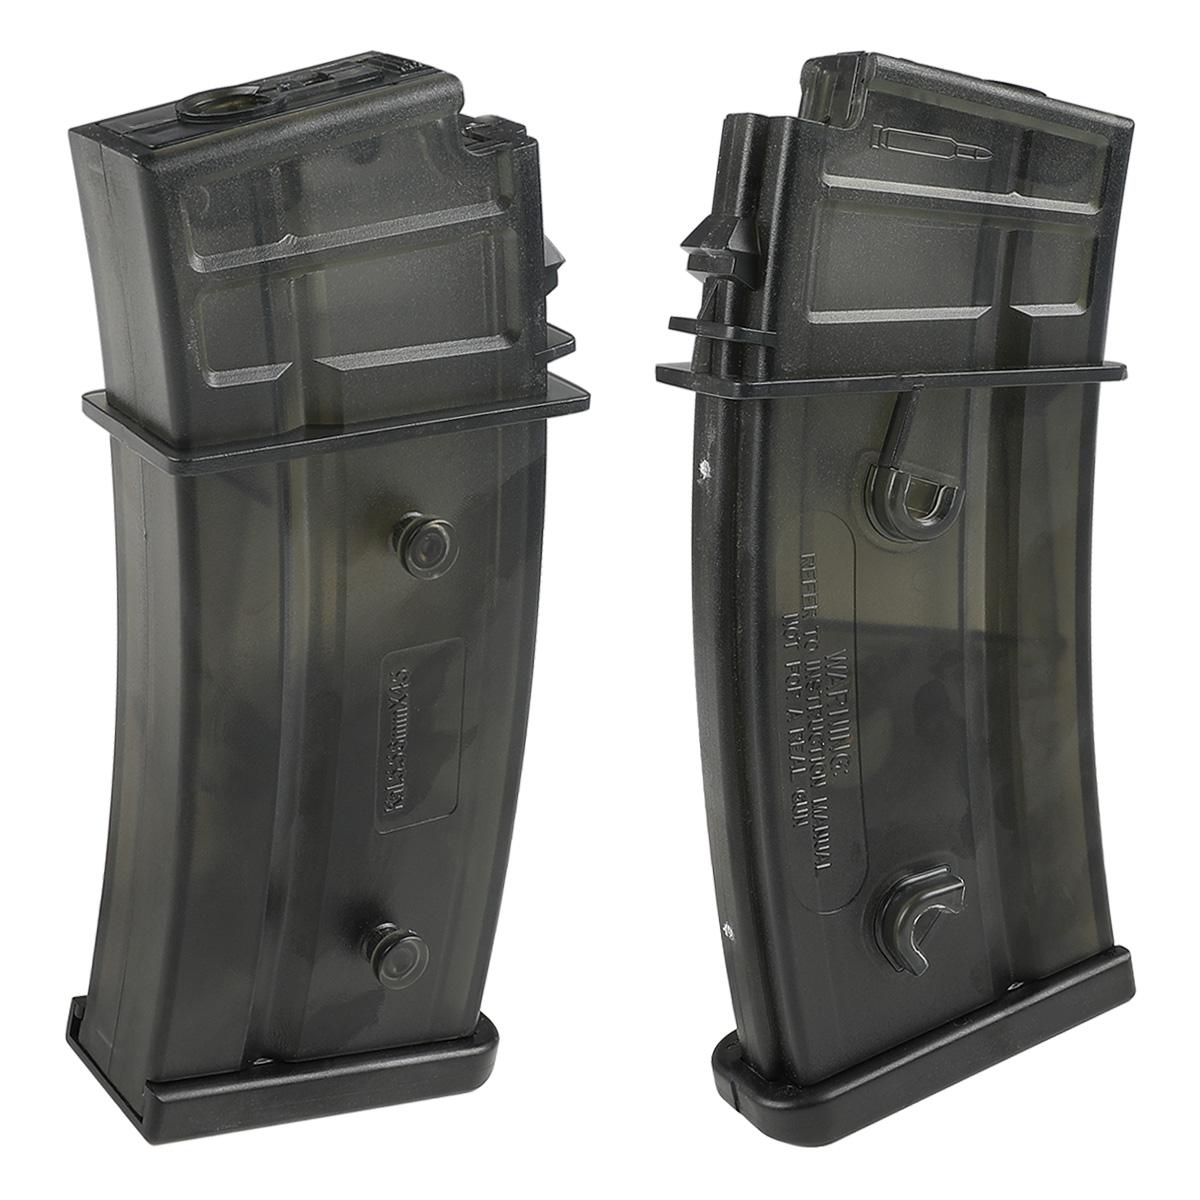 【同梱不可】 SRC H&K XM8-CF フルサイズ電動ガン NV Black (JP Ver.) 【配送業者:佐川急便限定】